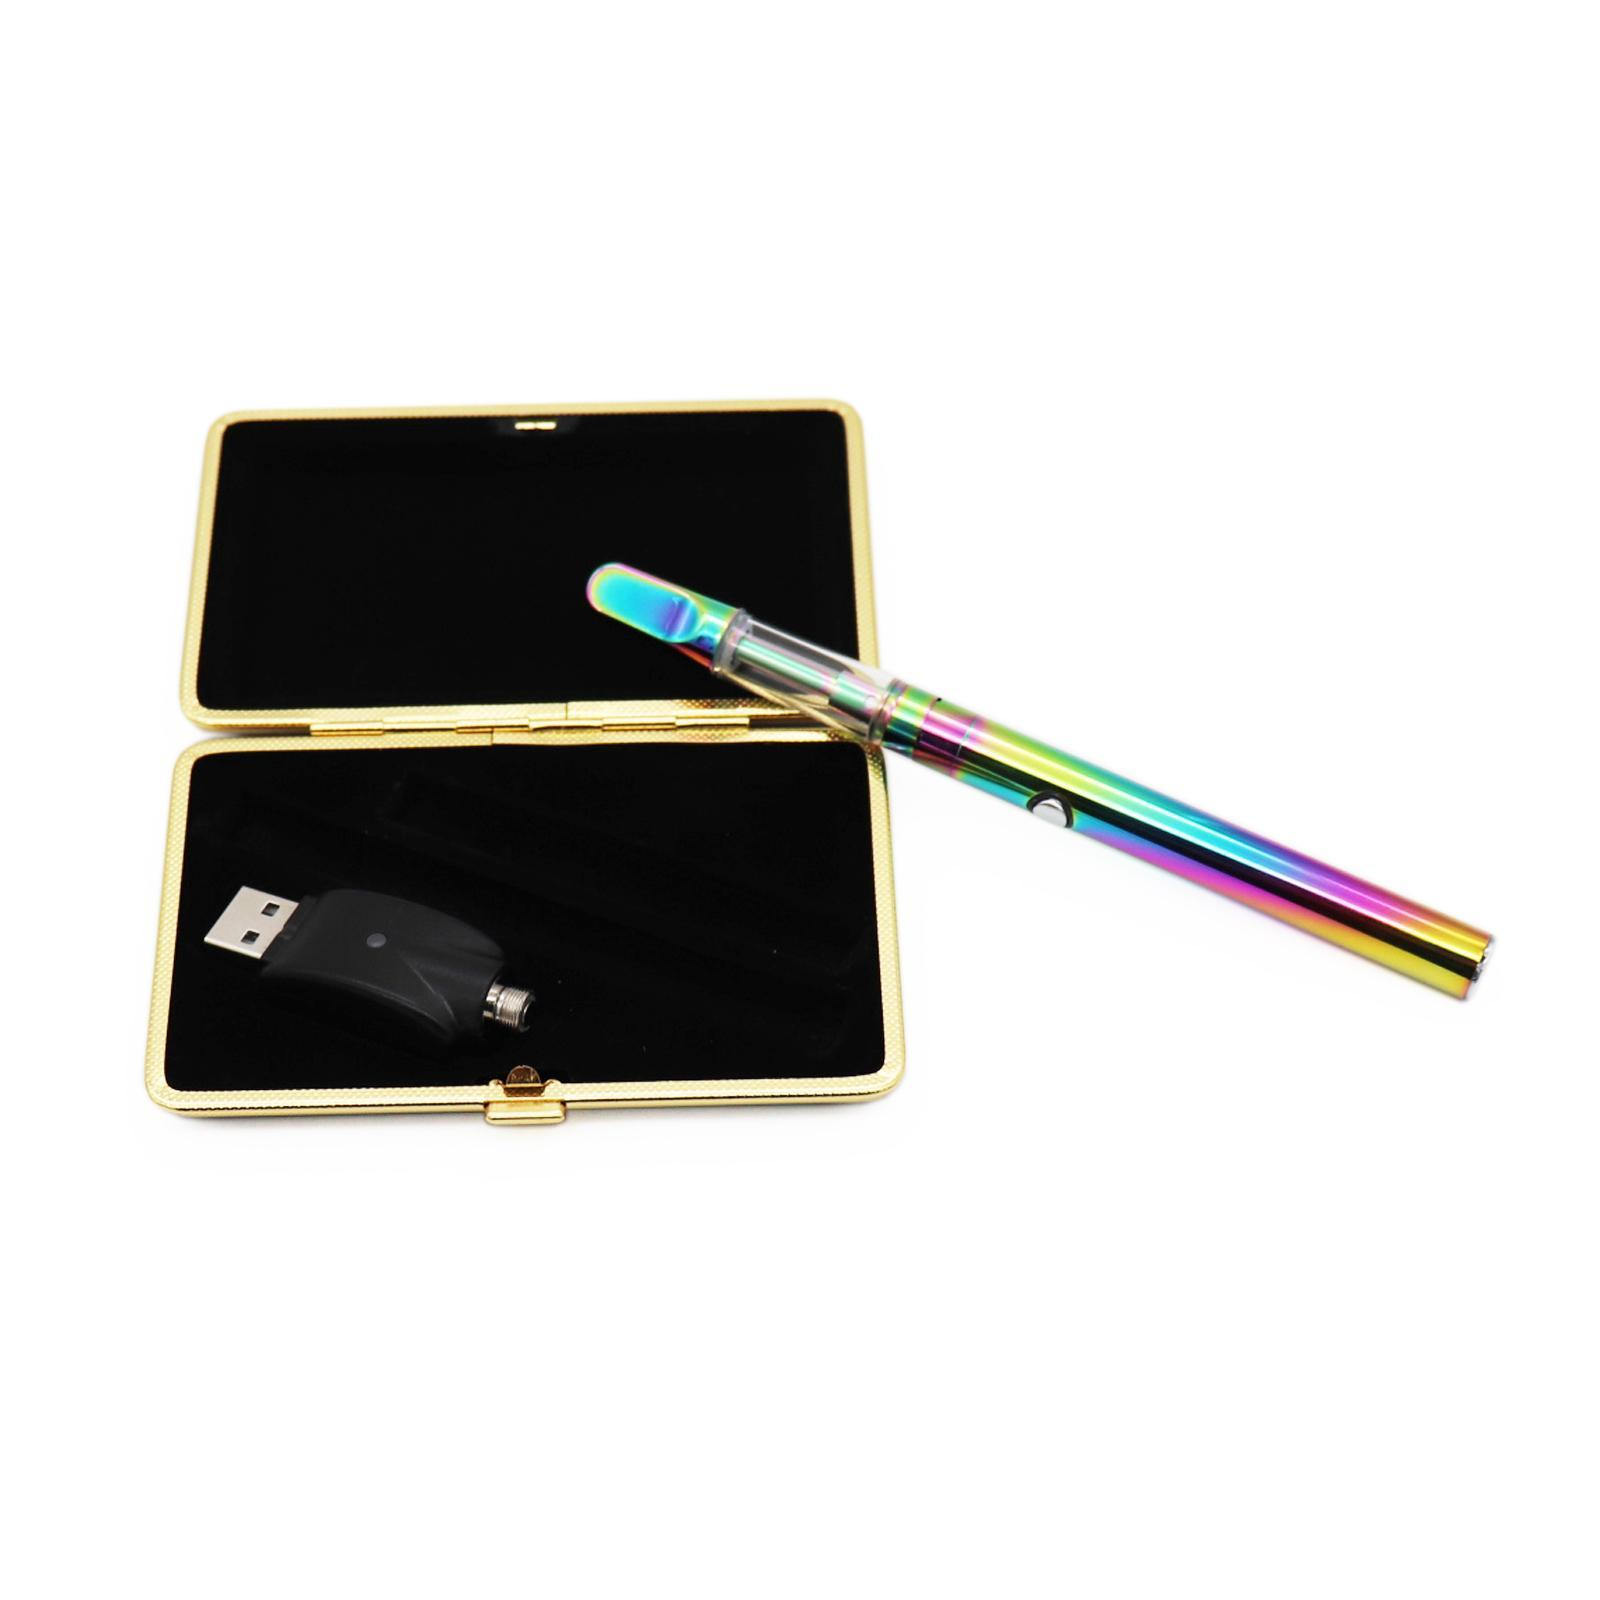 U.S. Direct Shipping Rainbow Vape Pen Kit Kit Penna sigaretta elettronica 510 Cartuccia penna a cera filettata con caricabatterie da 400 mAh